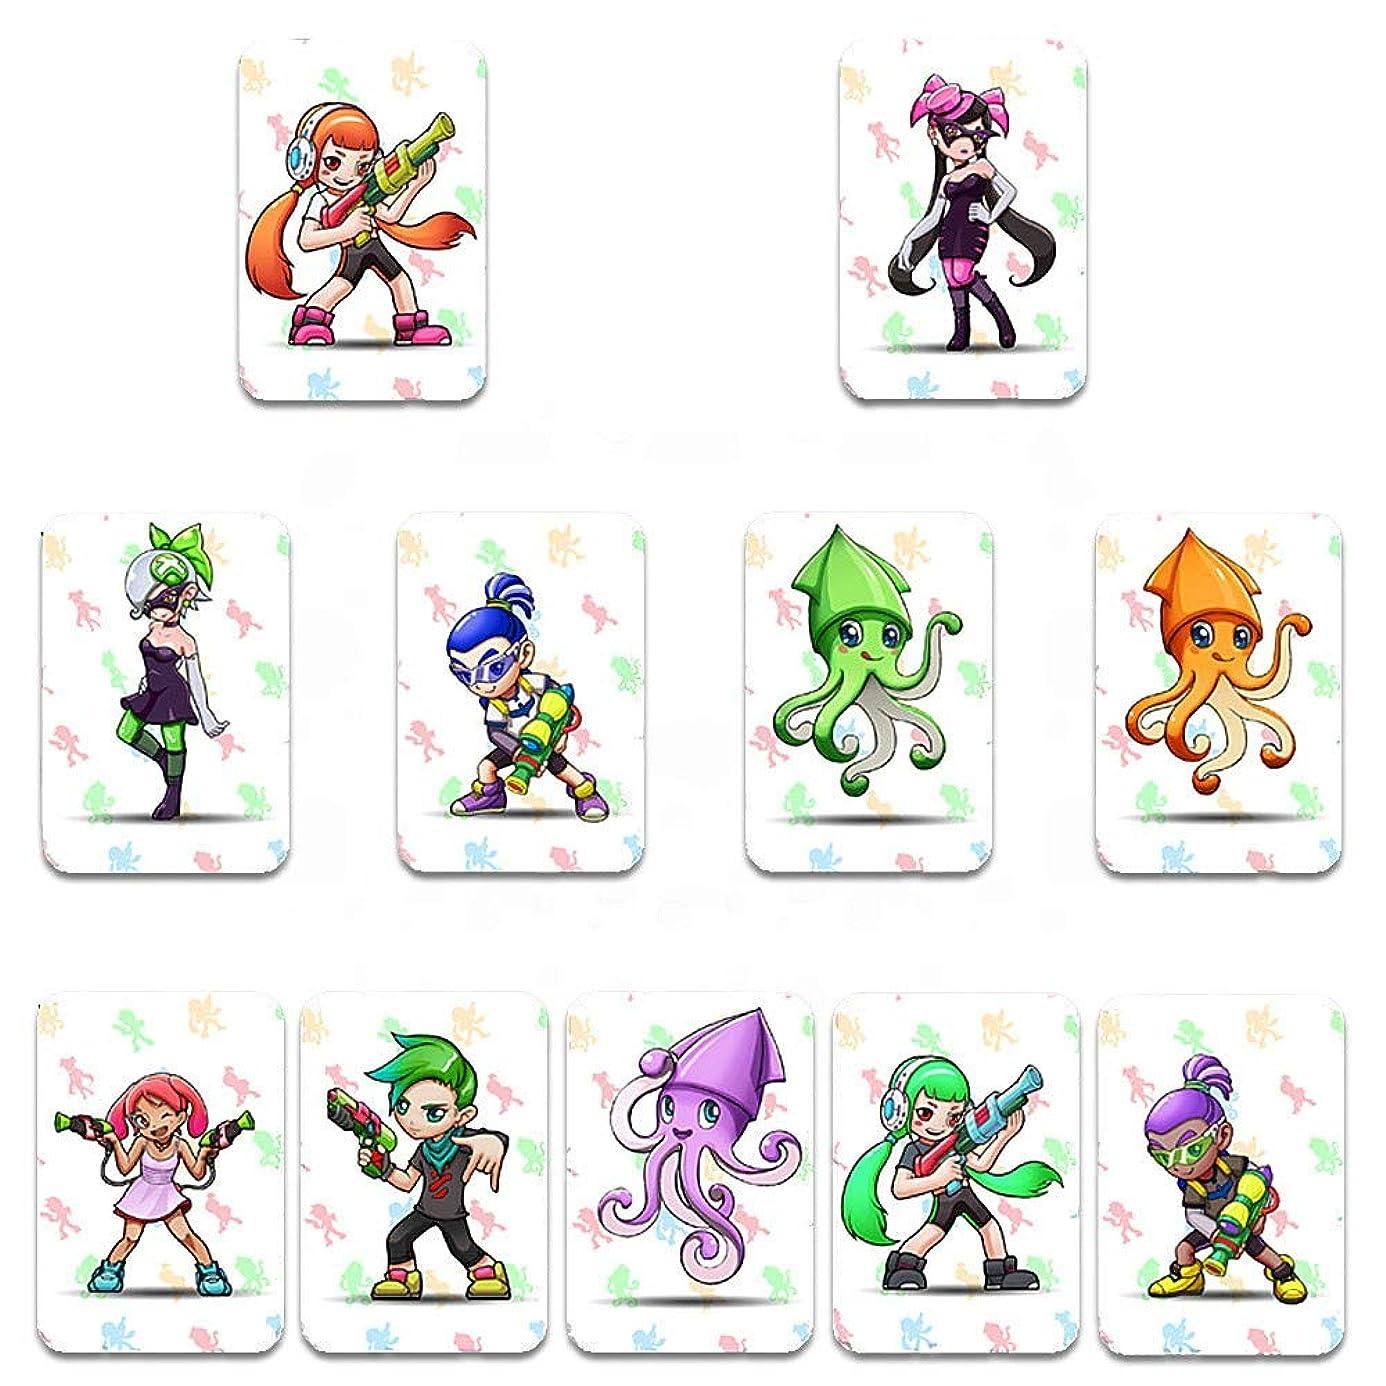 HeavenSense 11pcs NFC 215 Tag Game Cards for Switch/Wii U - Quarkscm